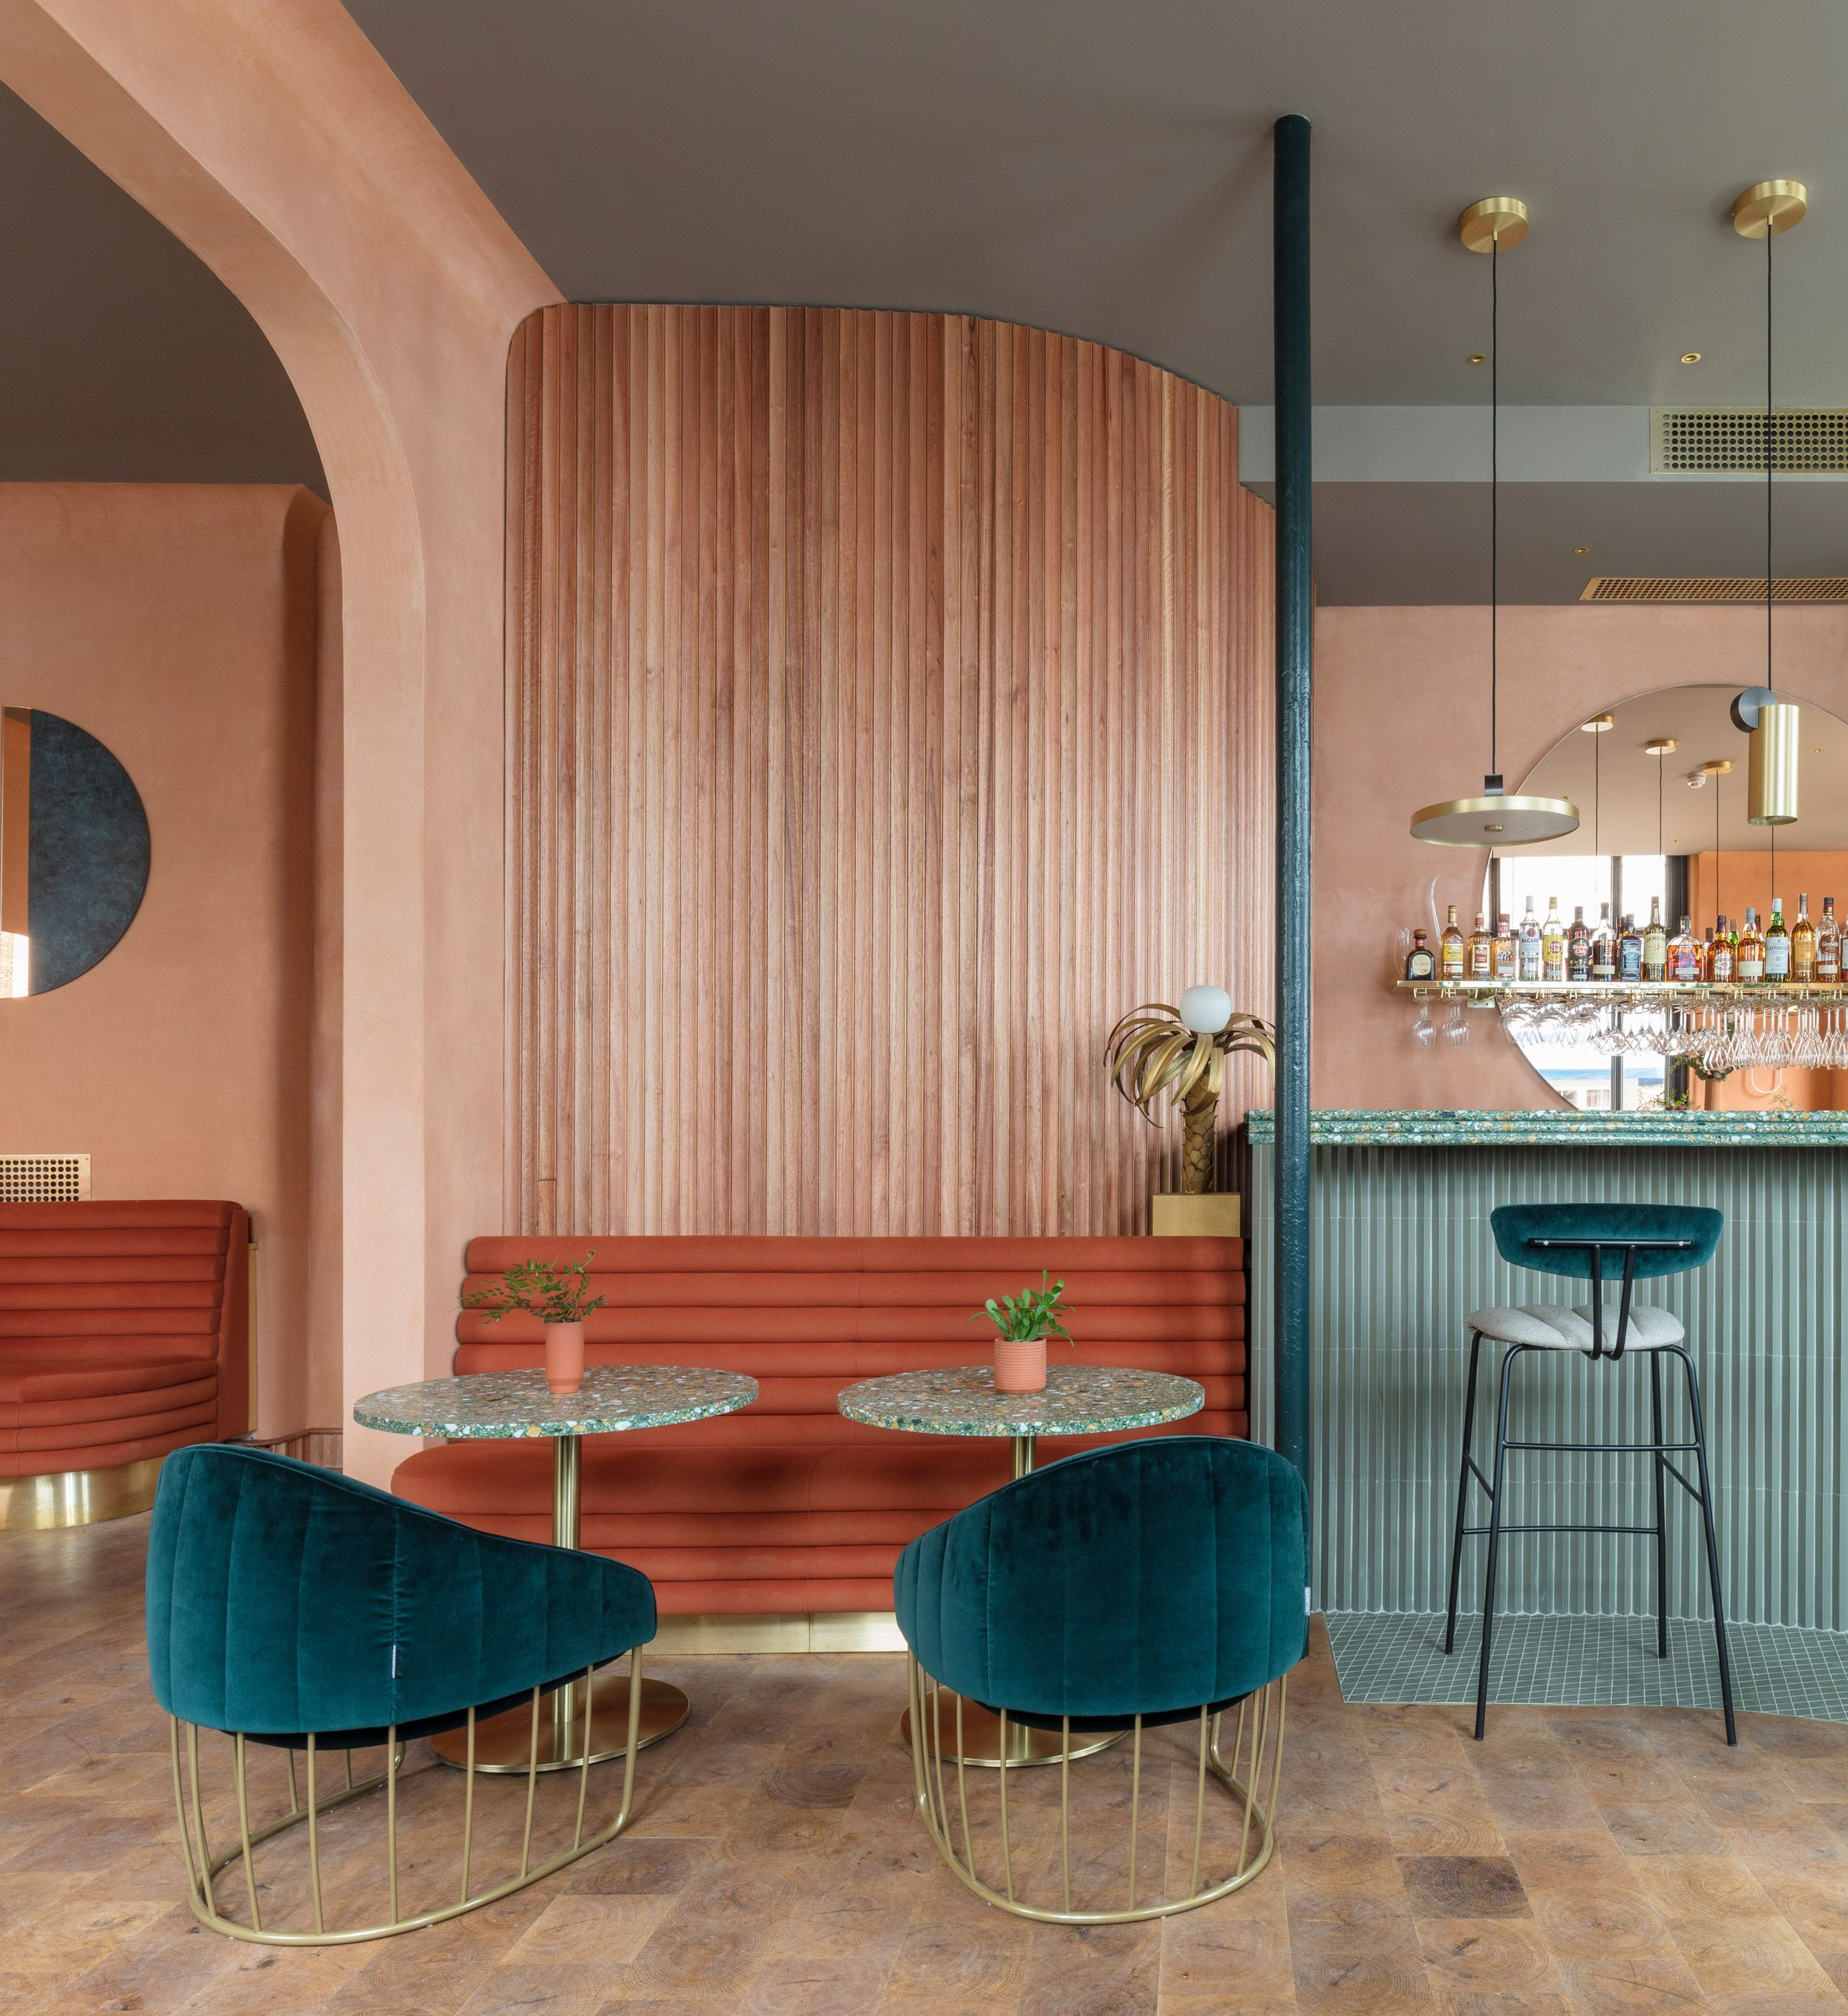 Casbah Mediterranean Kitchen: 거실 디자인, 인테리어, 병원 디자인